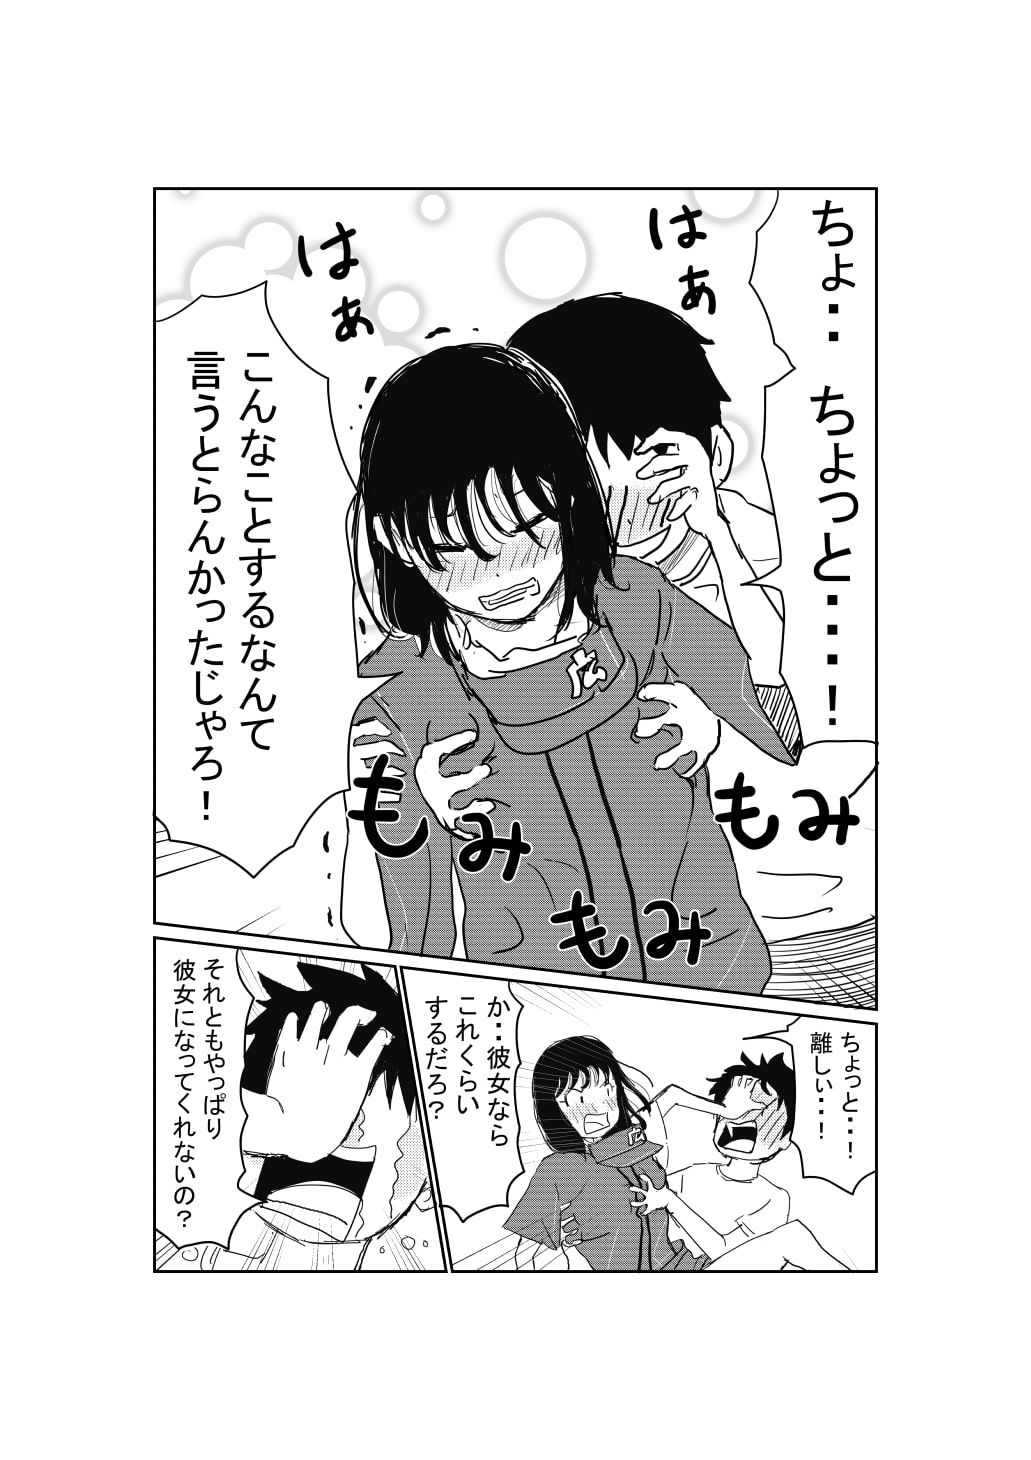 Corrupting a Hir*shima University Girl